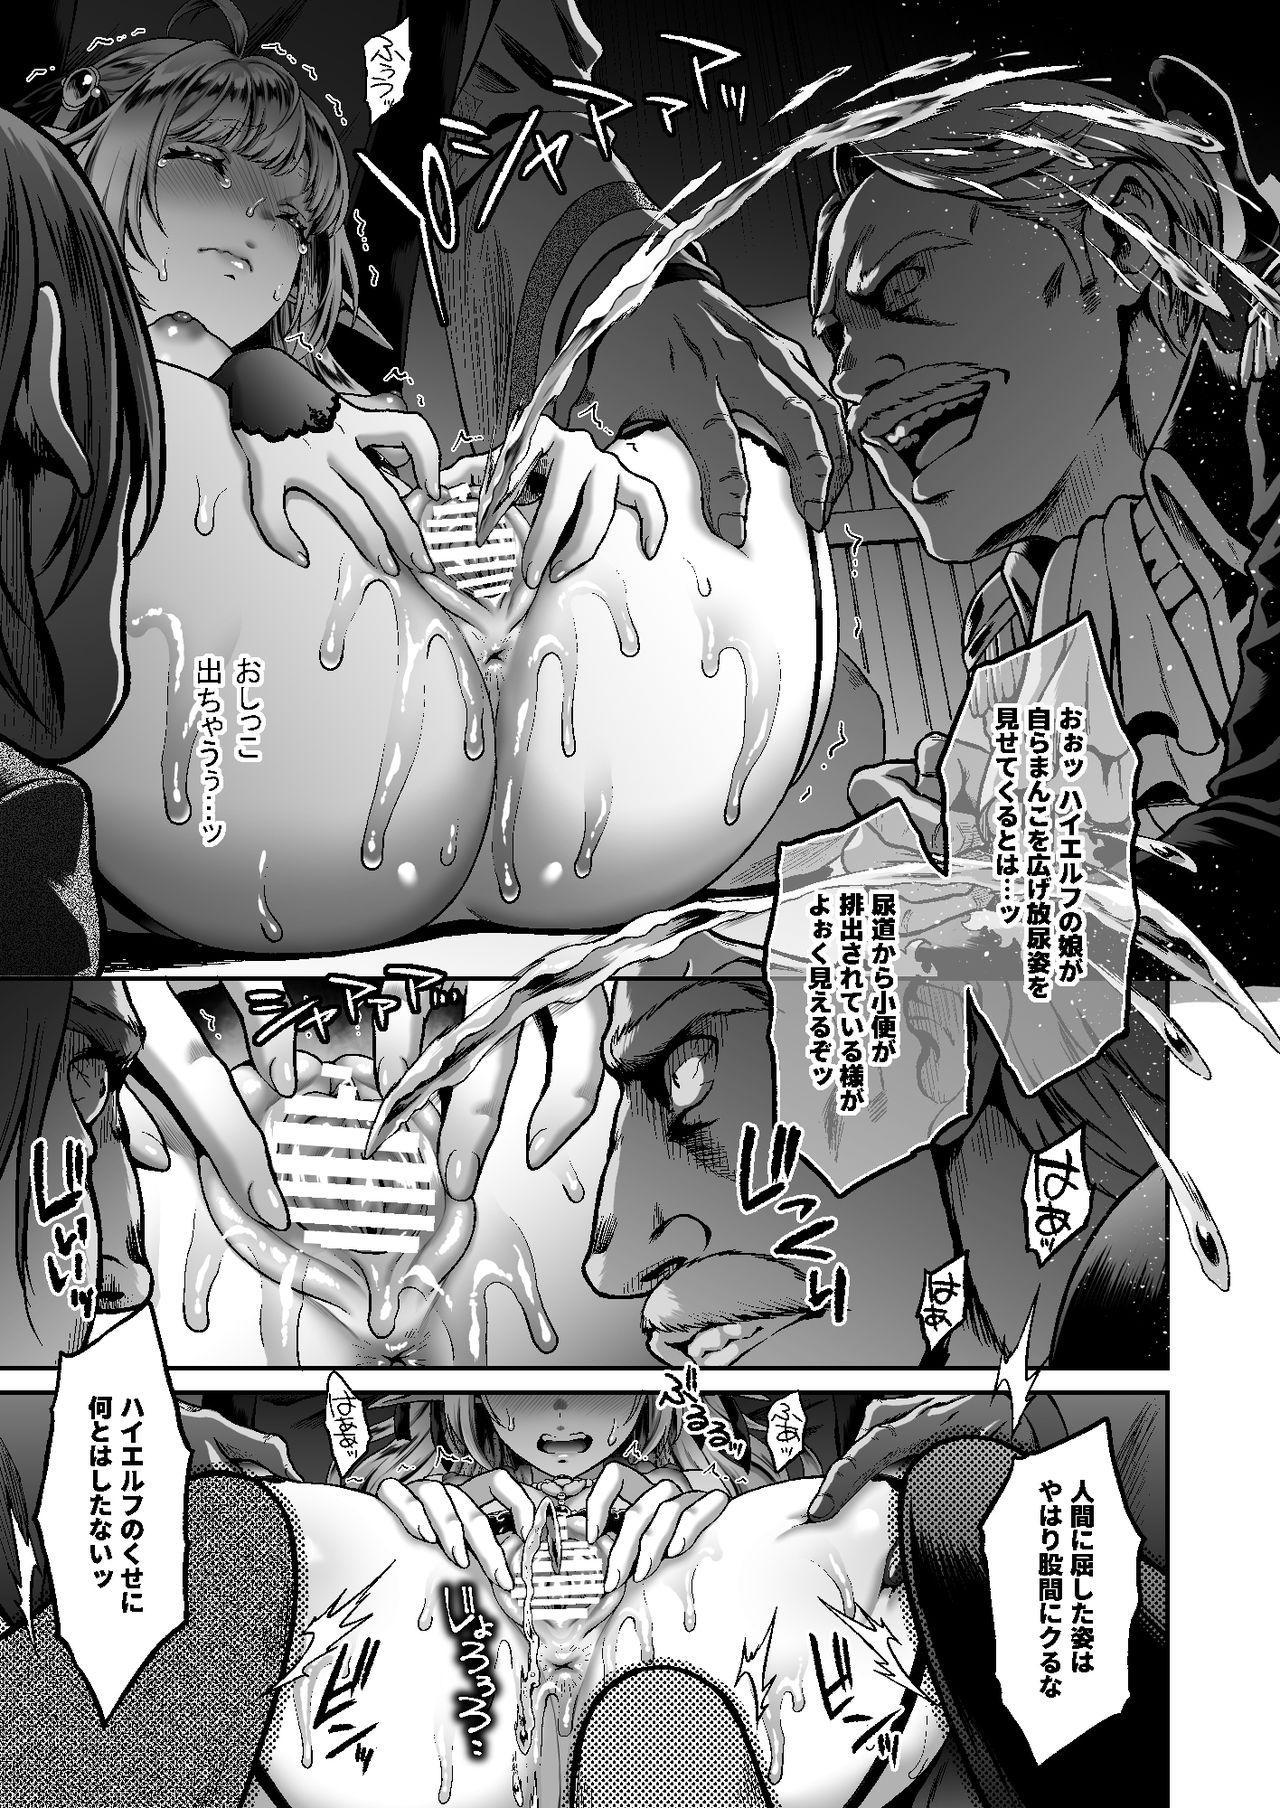 Tasogare no Shou Elf 6 - The story of Emma's side 10